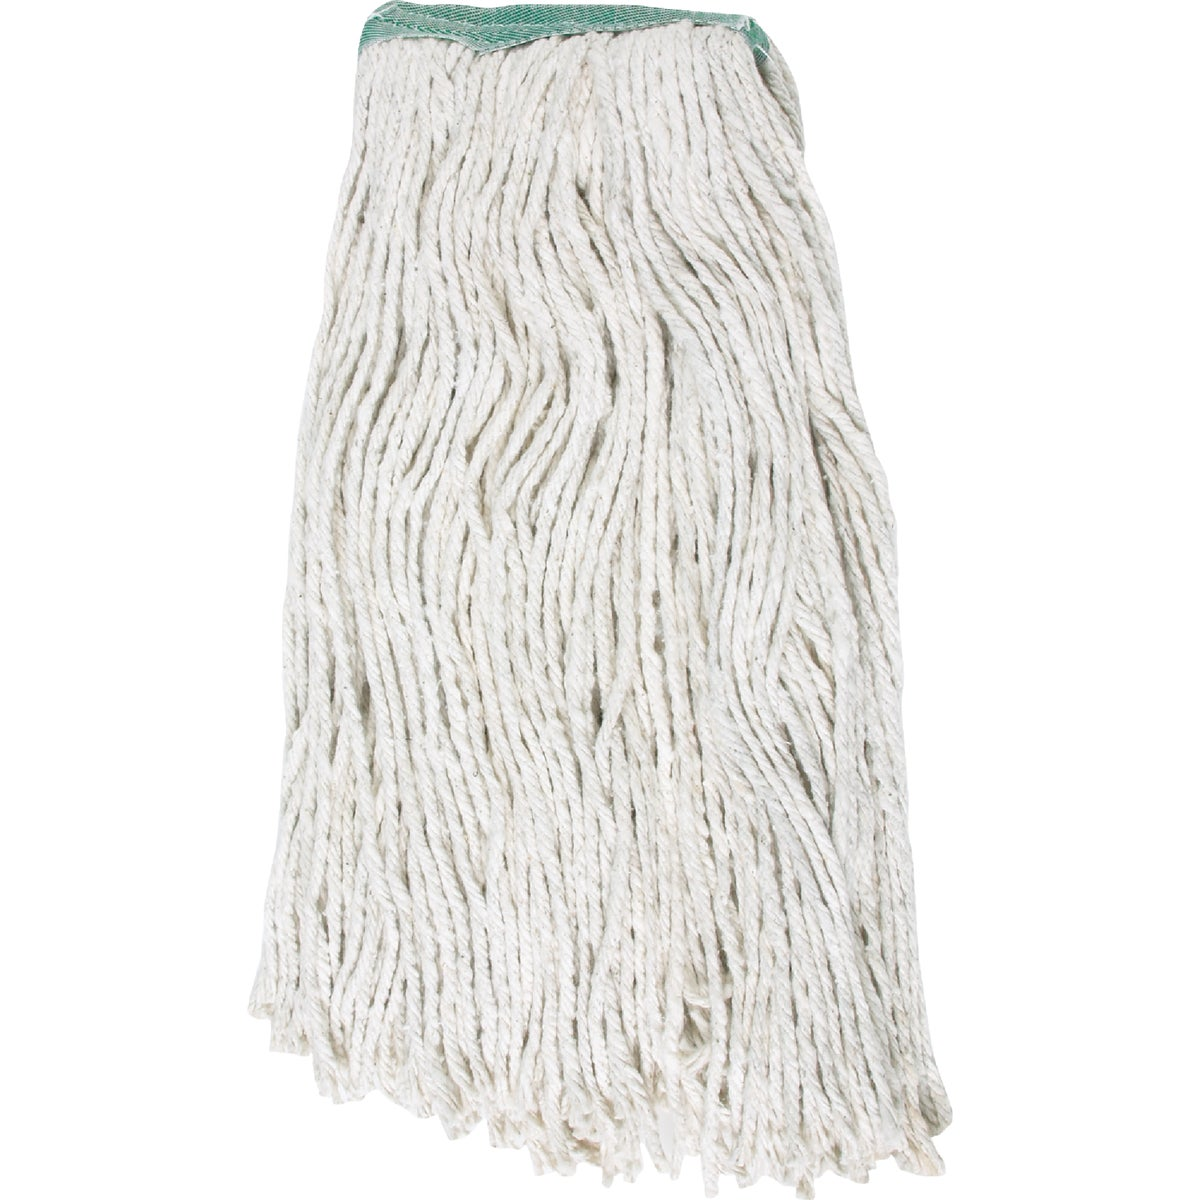 20Oz Cotton Mop